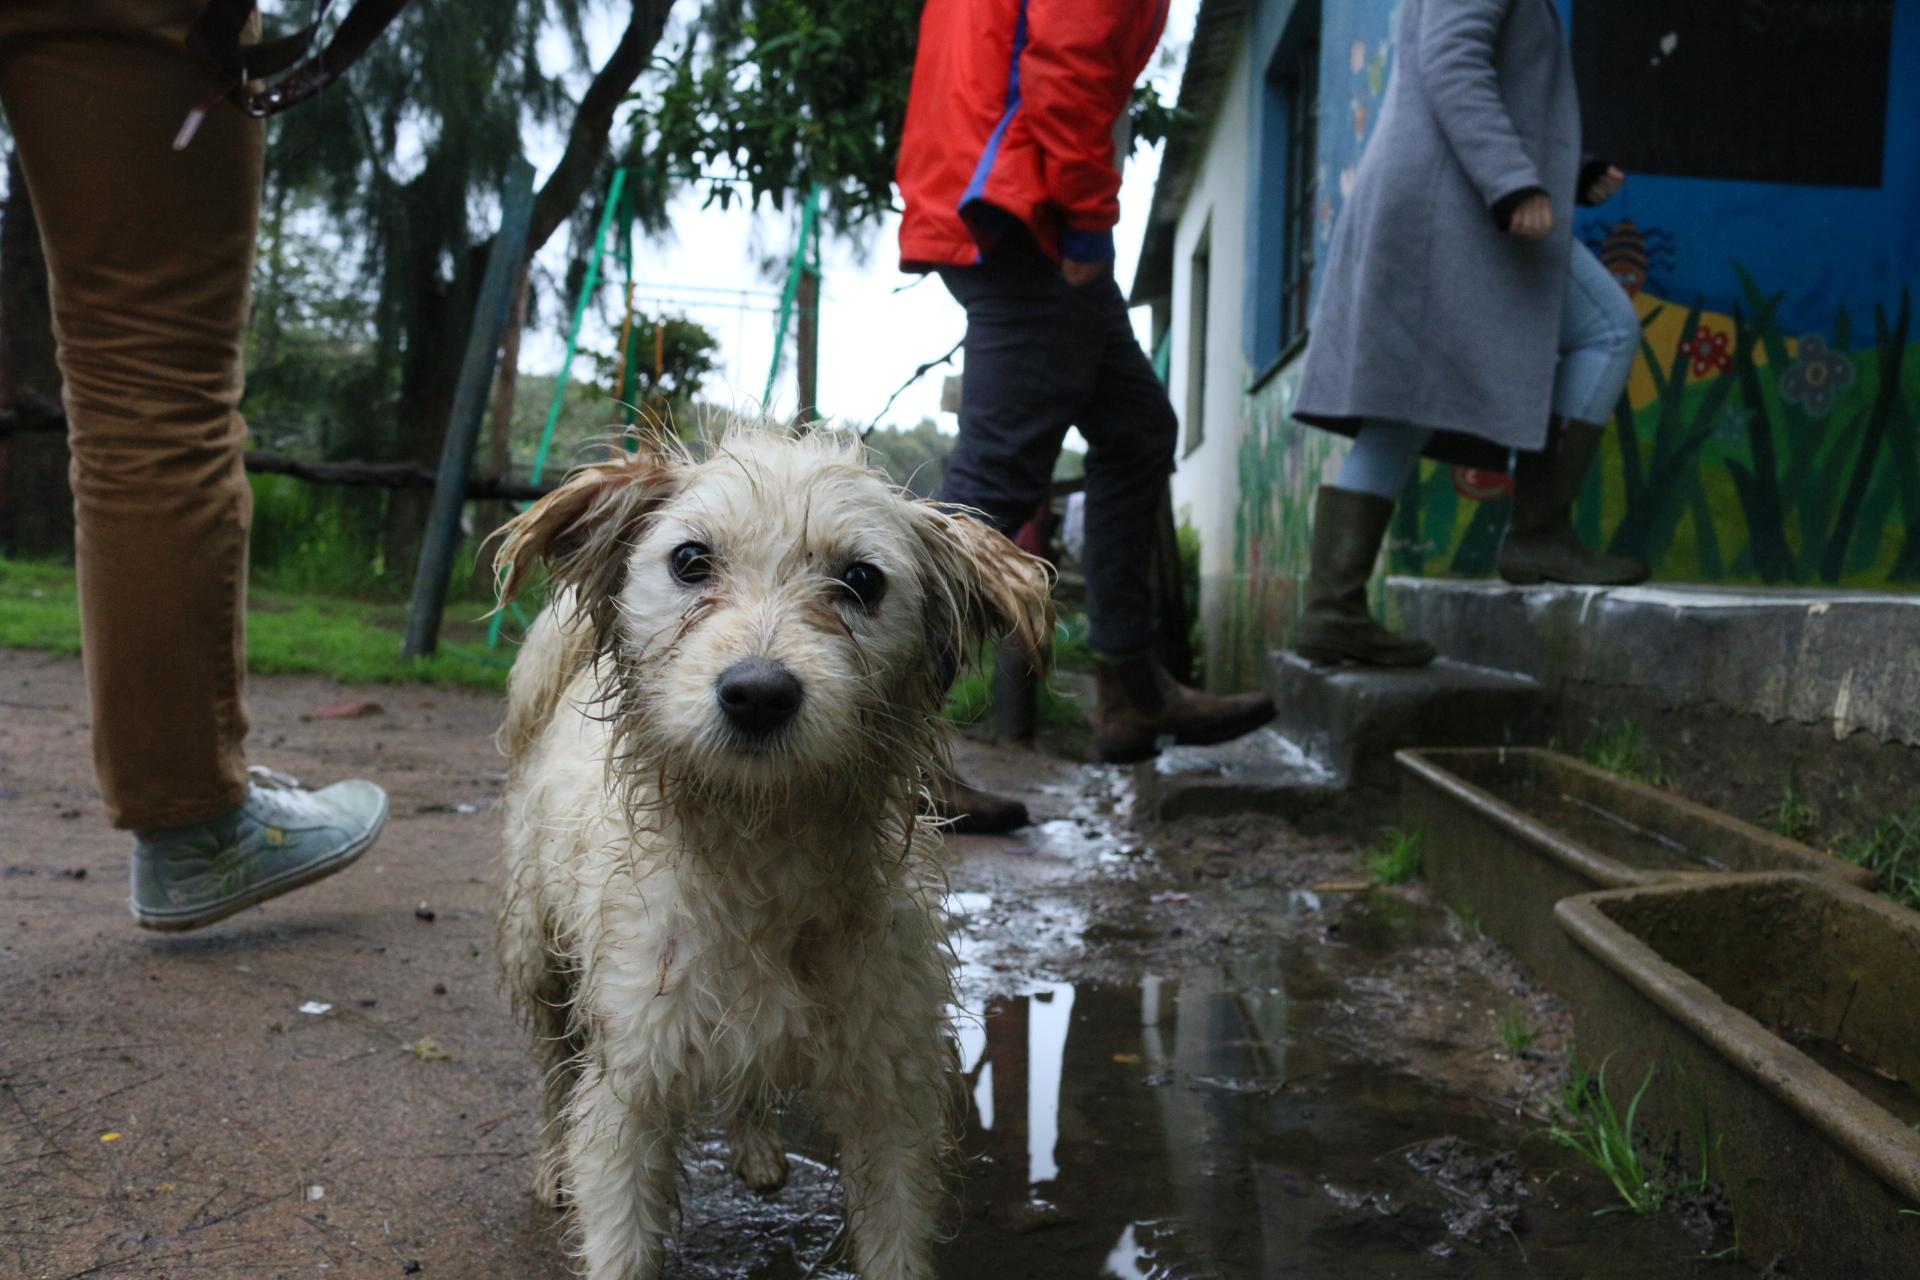 Muddy dog at Pebbles Project Flenterskloof